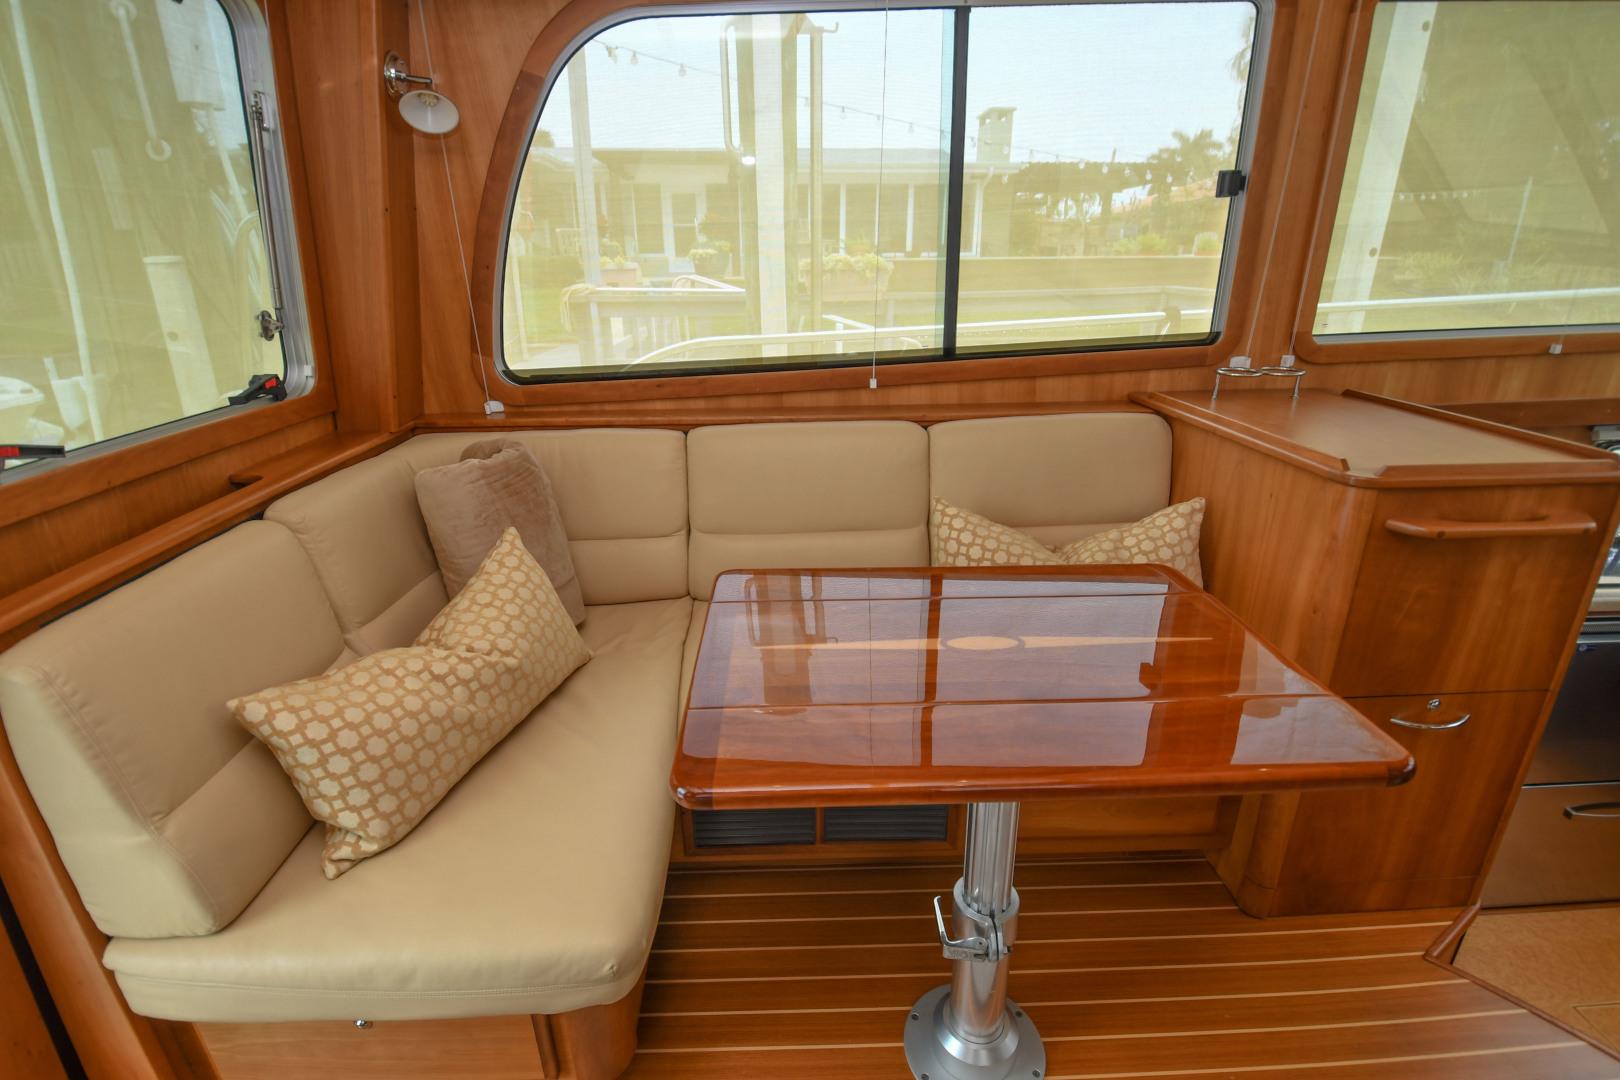 Sabre-40 Express 2010-Impulse Treasure Island-Florida-United States-2010 40 Sabre Express  Impulse  Companion Seating-1618633 | Thumbnail